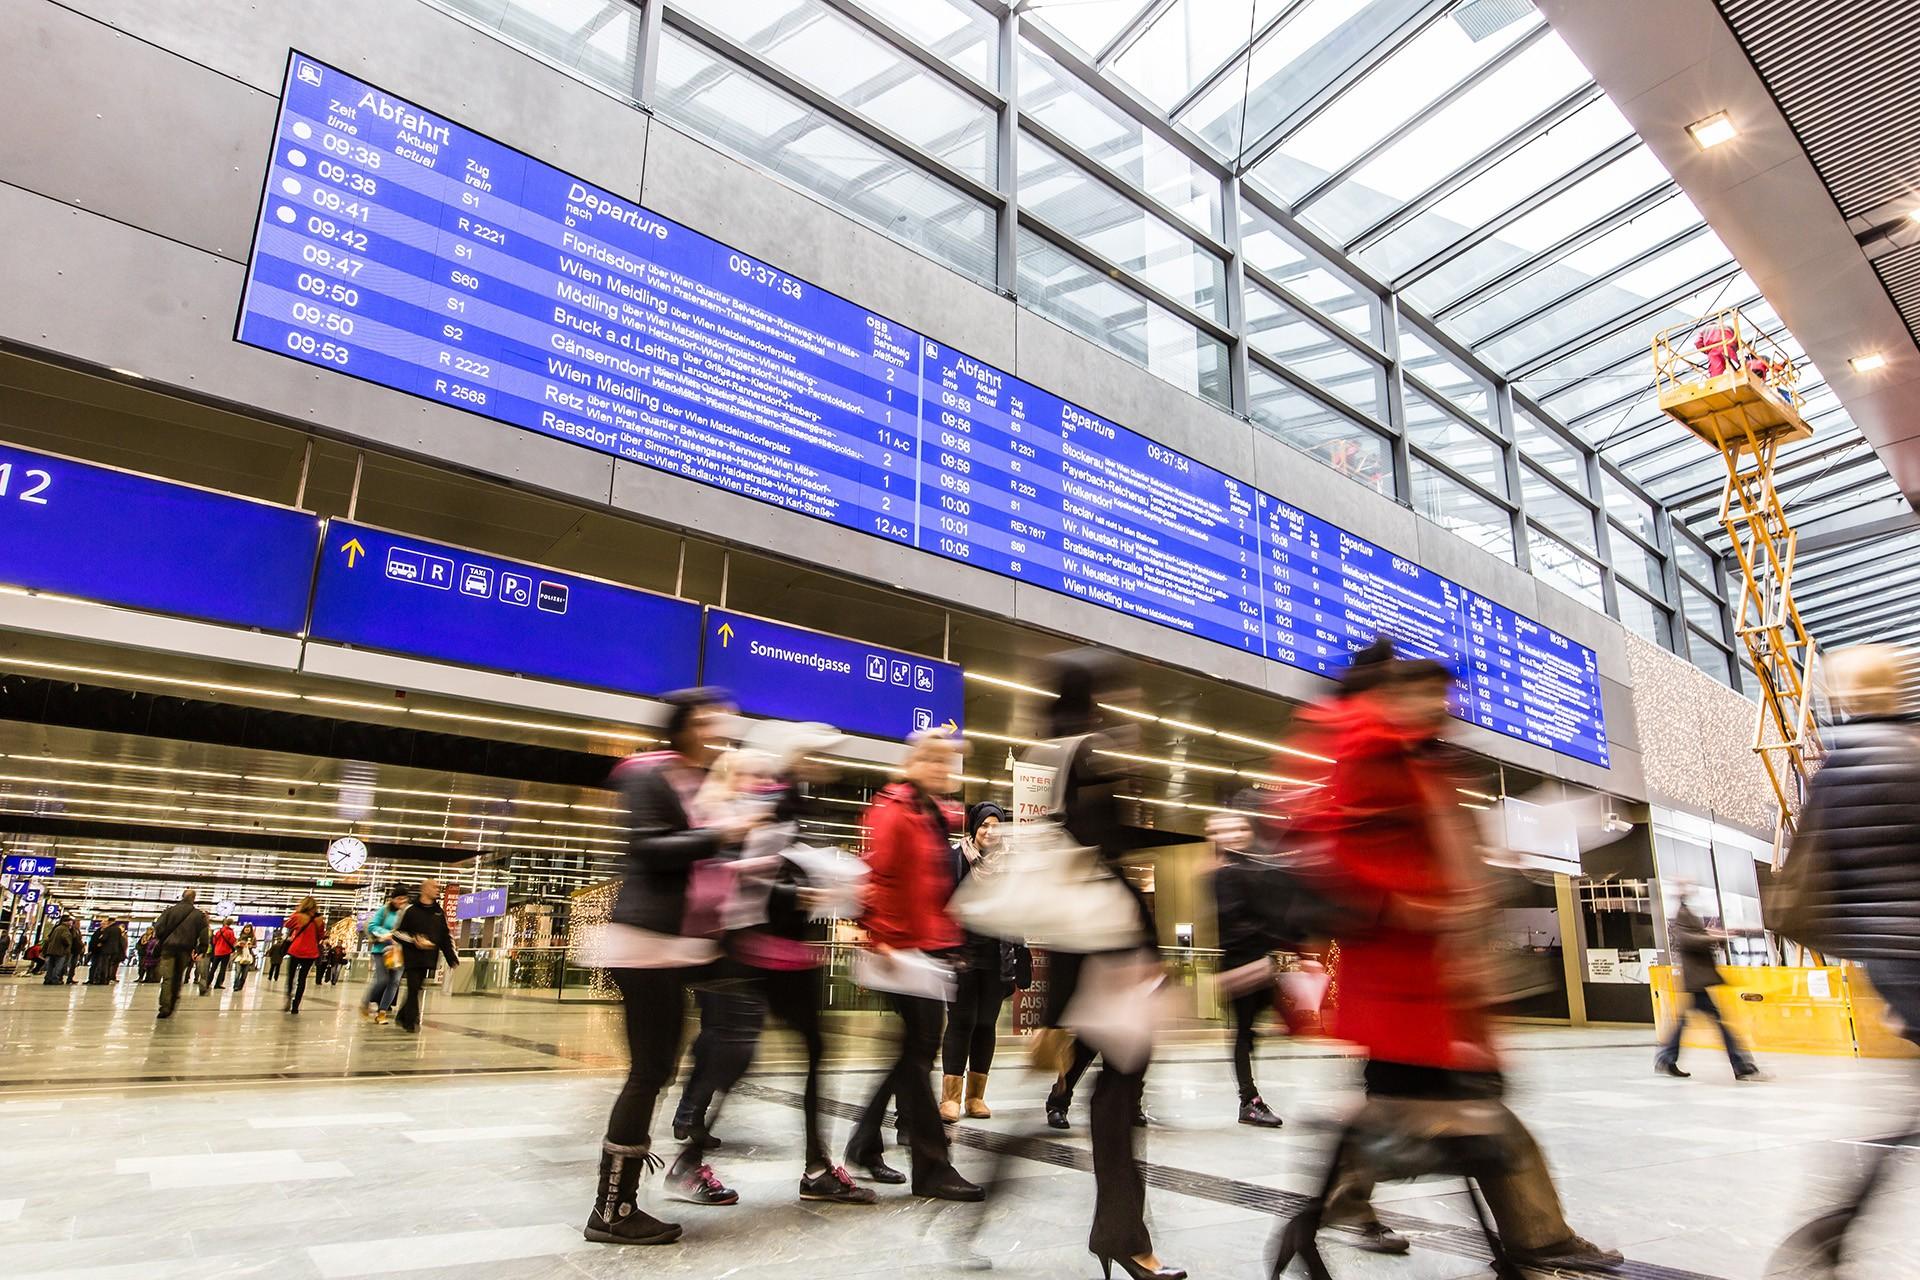 Soli957-Hauptbahnhof--_T8A7395--(C)©MichaelMazohl--1280px